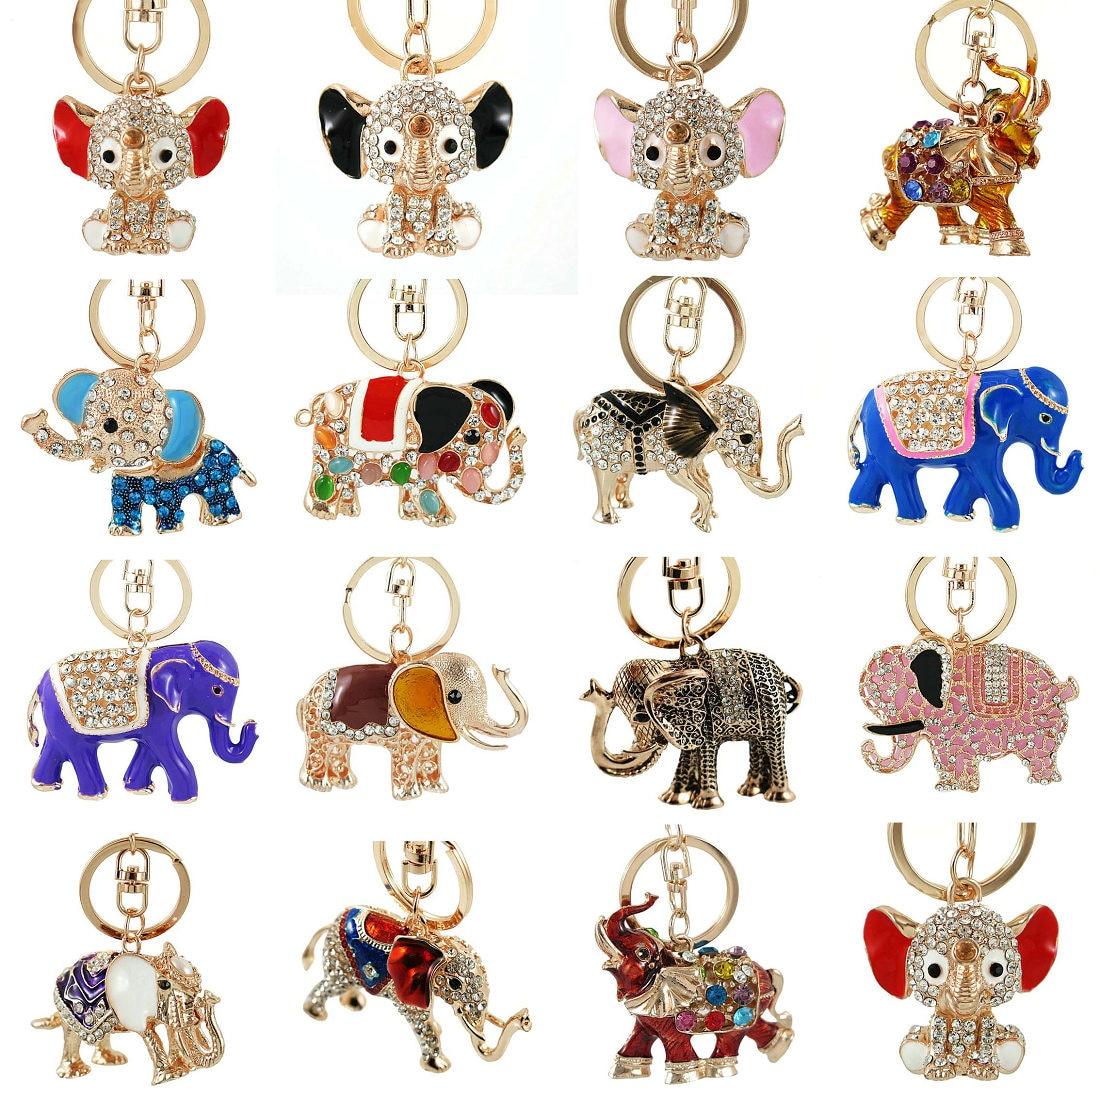 3D Auspicious Multiple Styles Elephant Key Holder Chains Whole Enamel Colorful Crystal Bag Pendant Keyrings KeyChains For Women